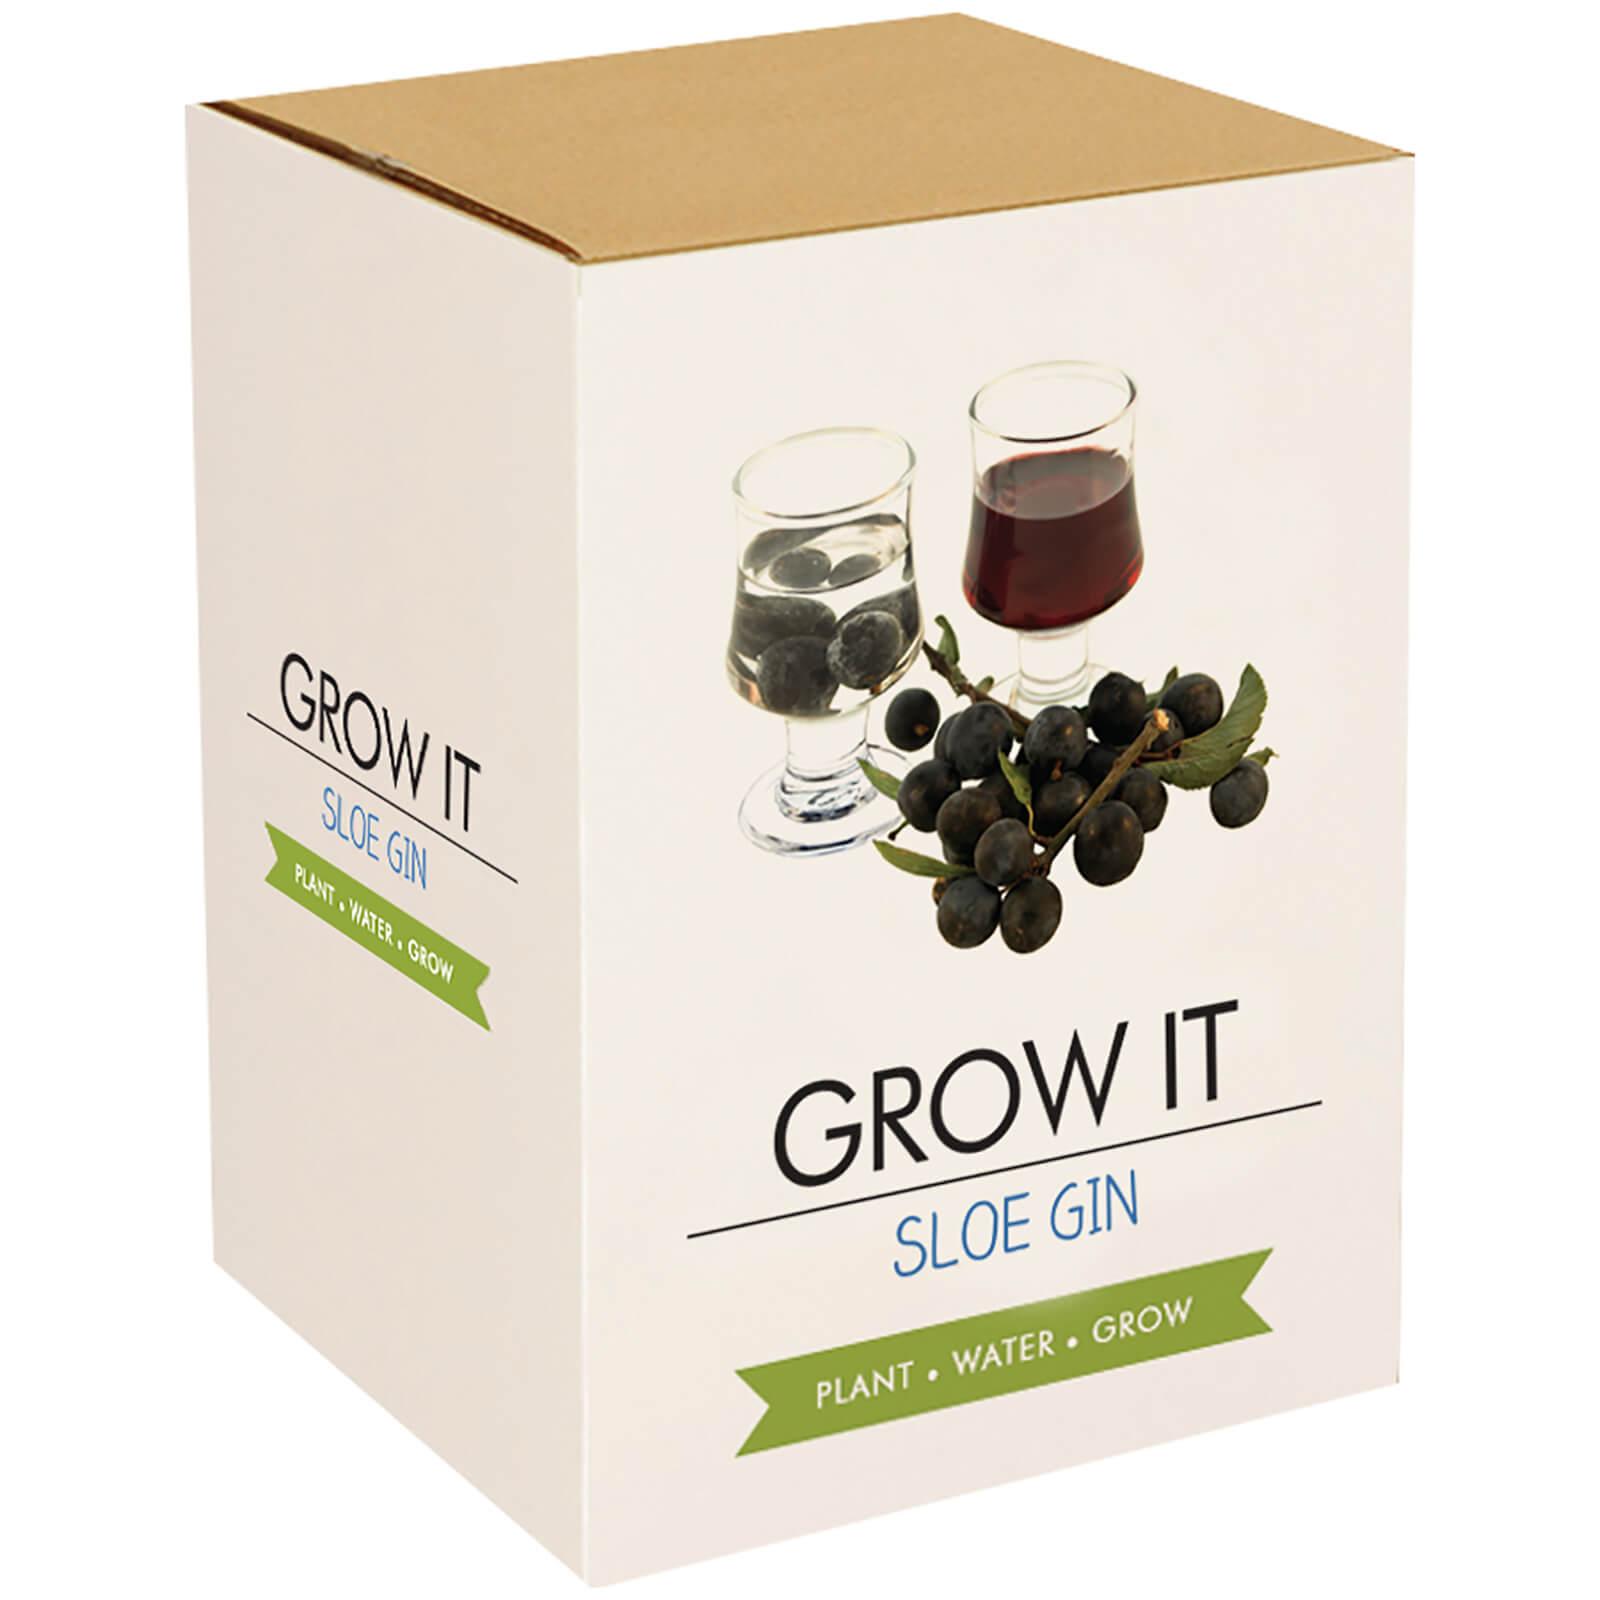 Image of Grow It Sloe Gin